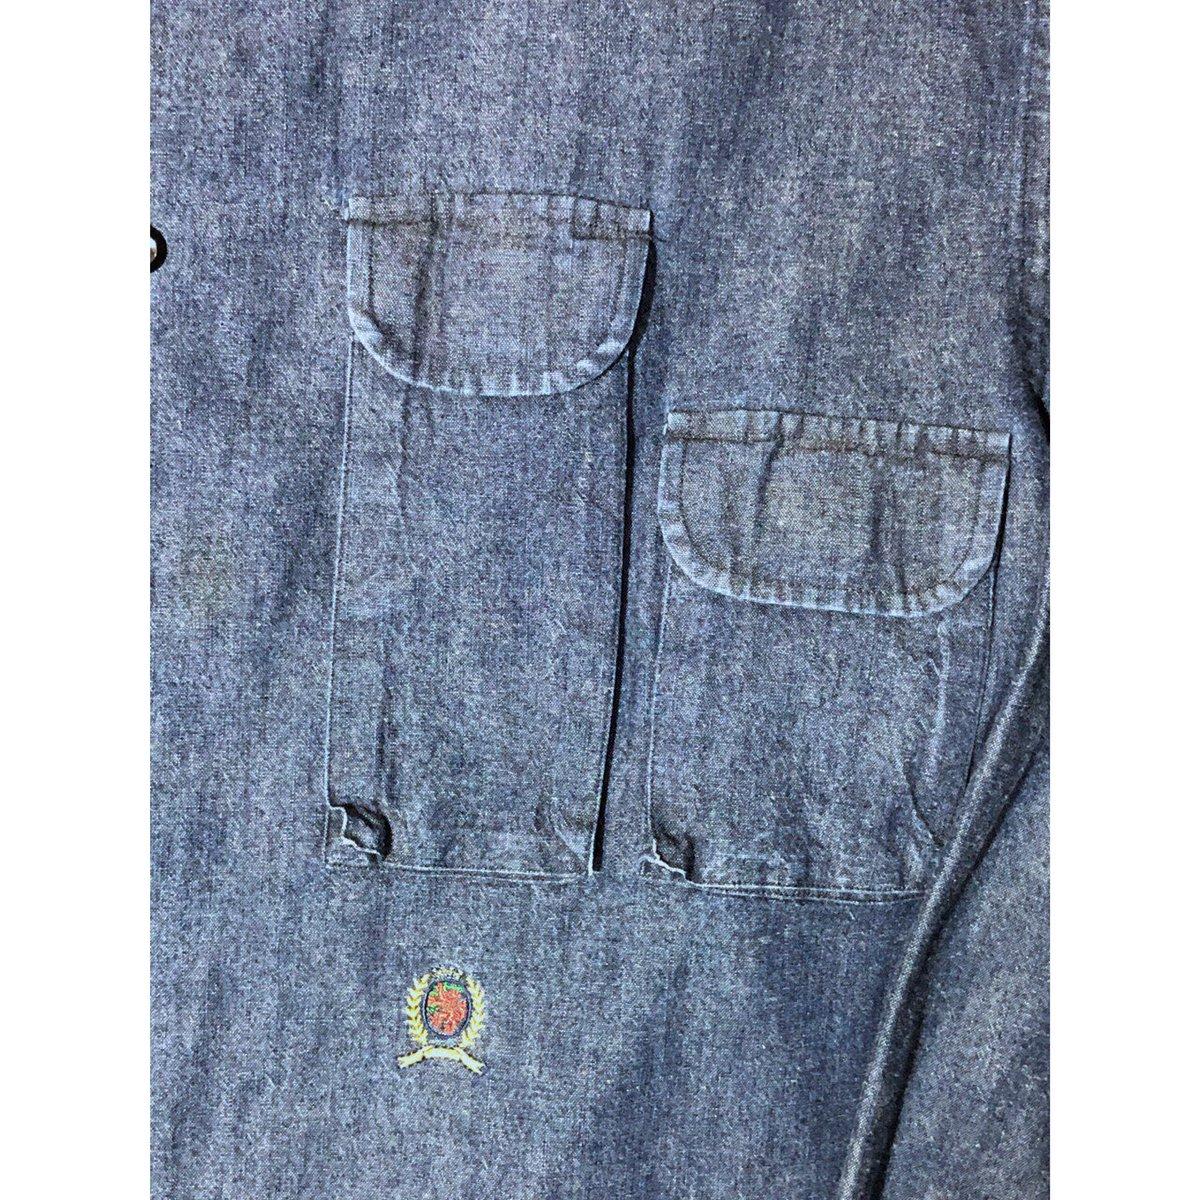 test ツイッターメディア - ≪TOMMY HILFIGER≫ chambray shirt 一見フラットなルックスに、アンナチュラルなポケット。  1枚の服の中に、ギャップを感じられる一着。  https://t.co/kMLzEpvq9Q https://t.co/cGQdv5dzNK